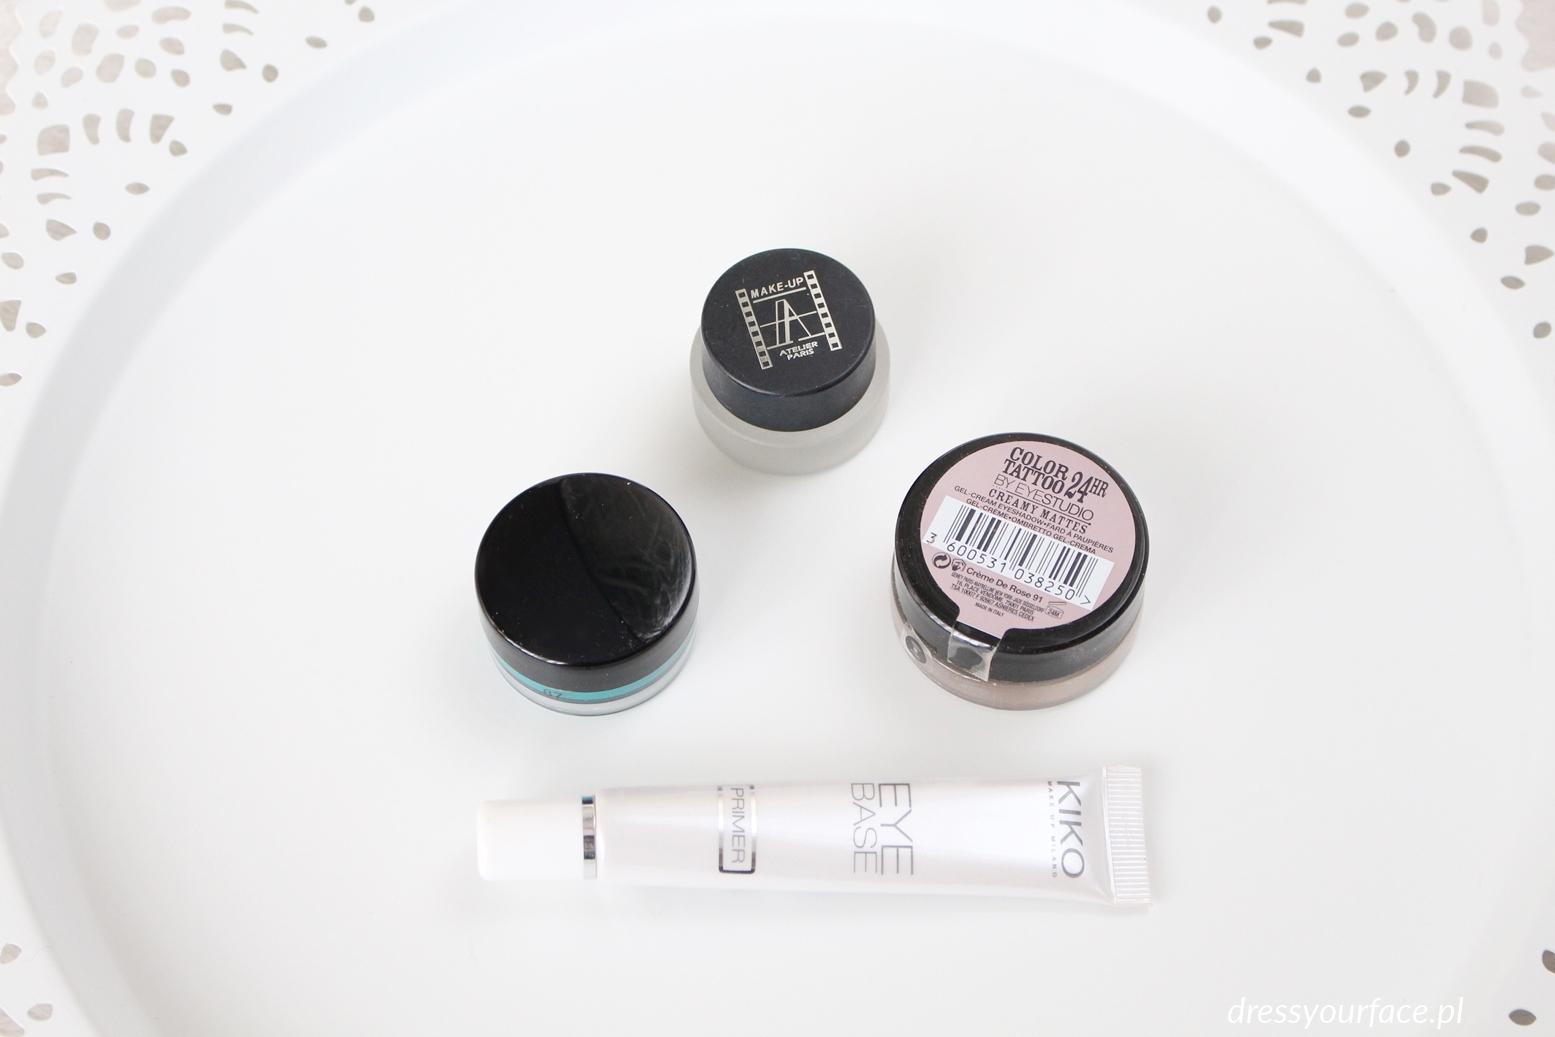 projekt_denko_makeup_atelier_paris_inglot_kiko_maybelline